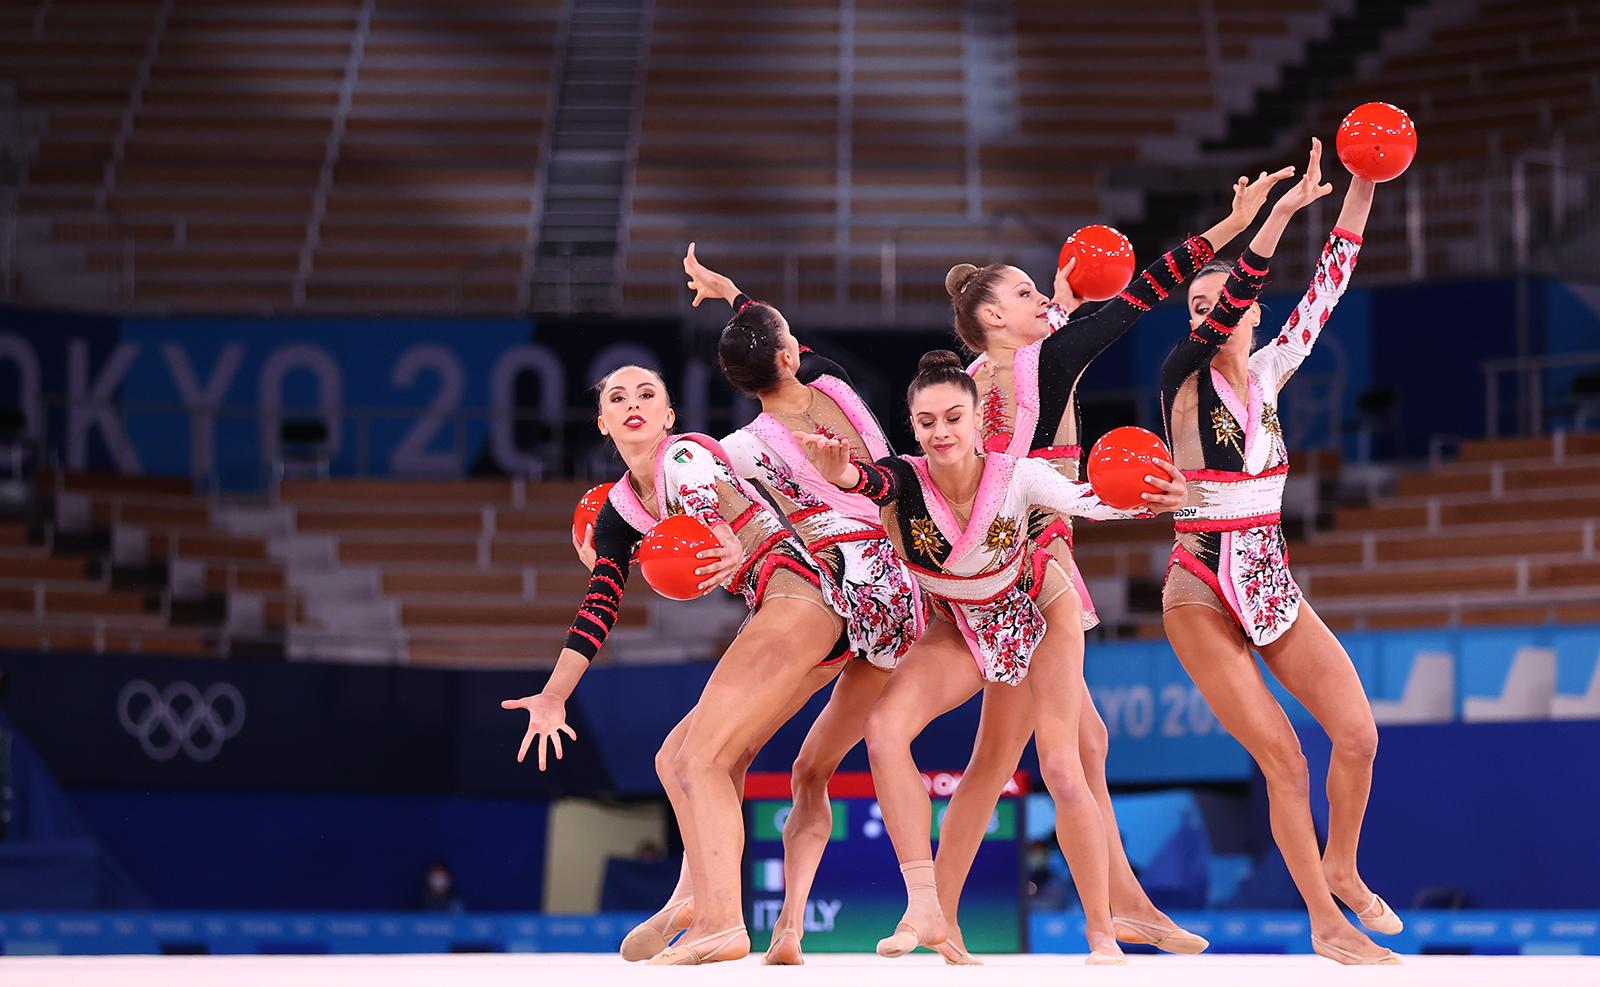 Tokyo 2020 Olympics - Gymnastics - Rhythmic - Group All-Around - Final - Rotation 1 - Ariake Gymnastics Centre, Tokyo, Japan - August 8, 2021. Team Italy in action with balls. REUTERS